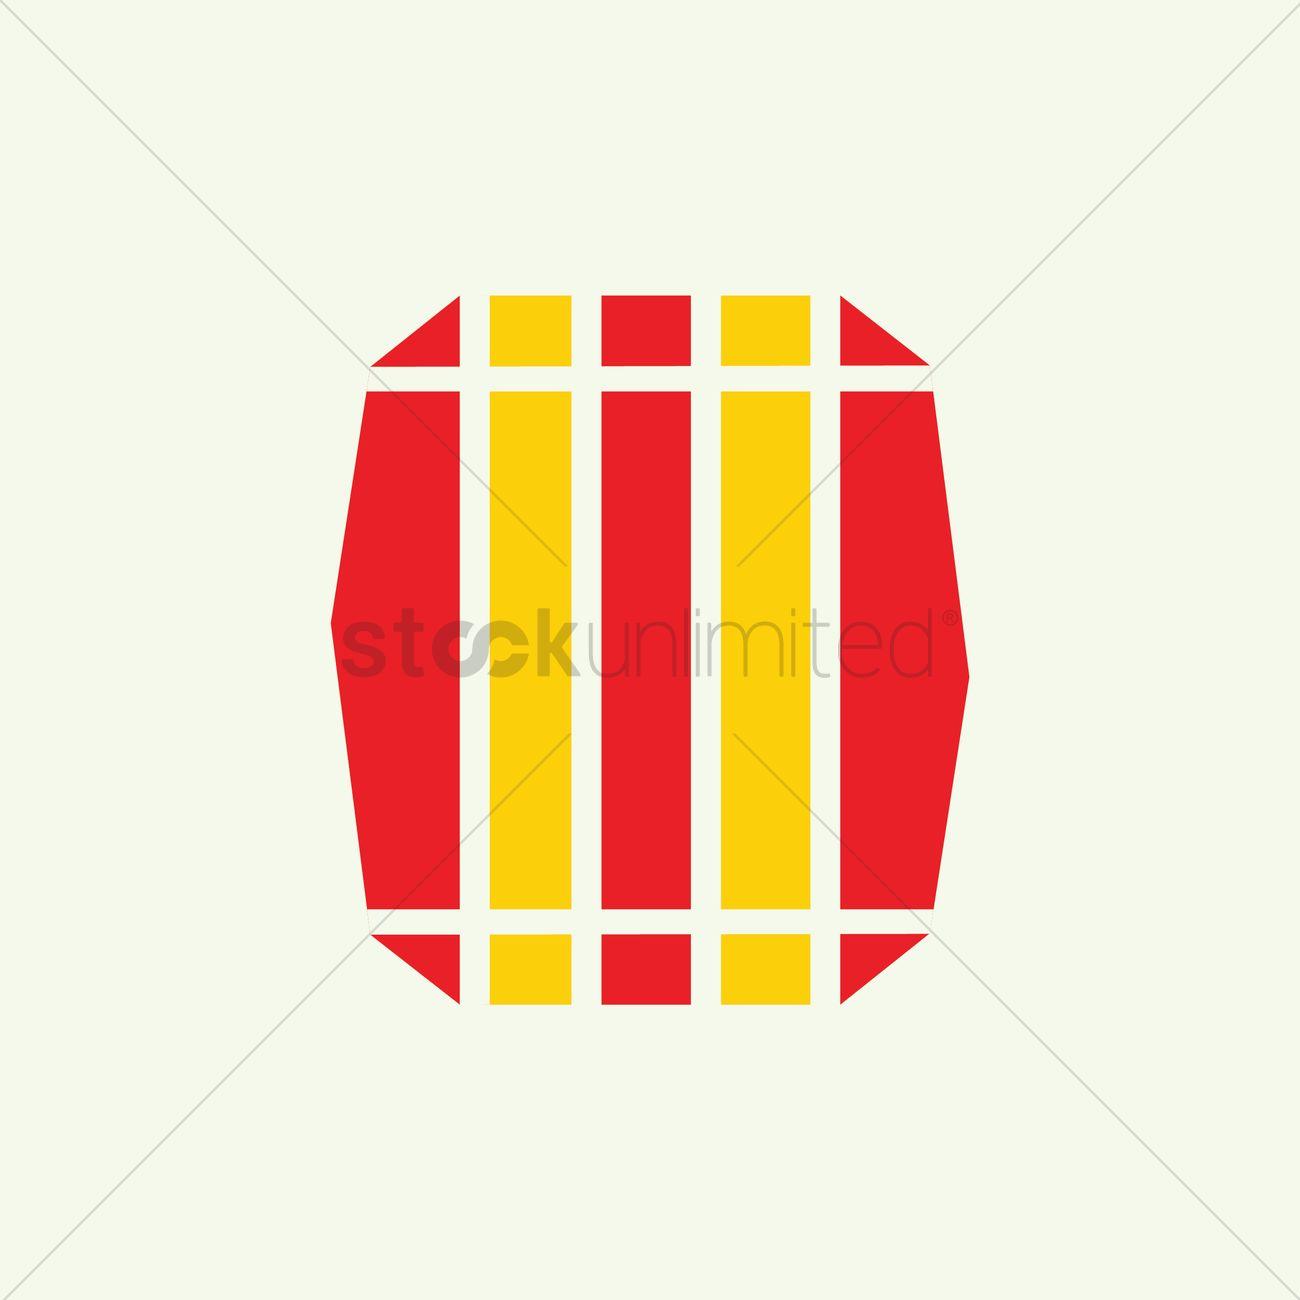 Free Wine barrel Vector Image - 1575396 | StockUnlimited